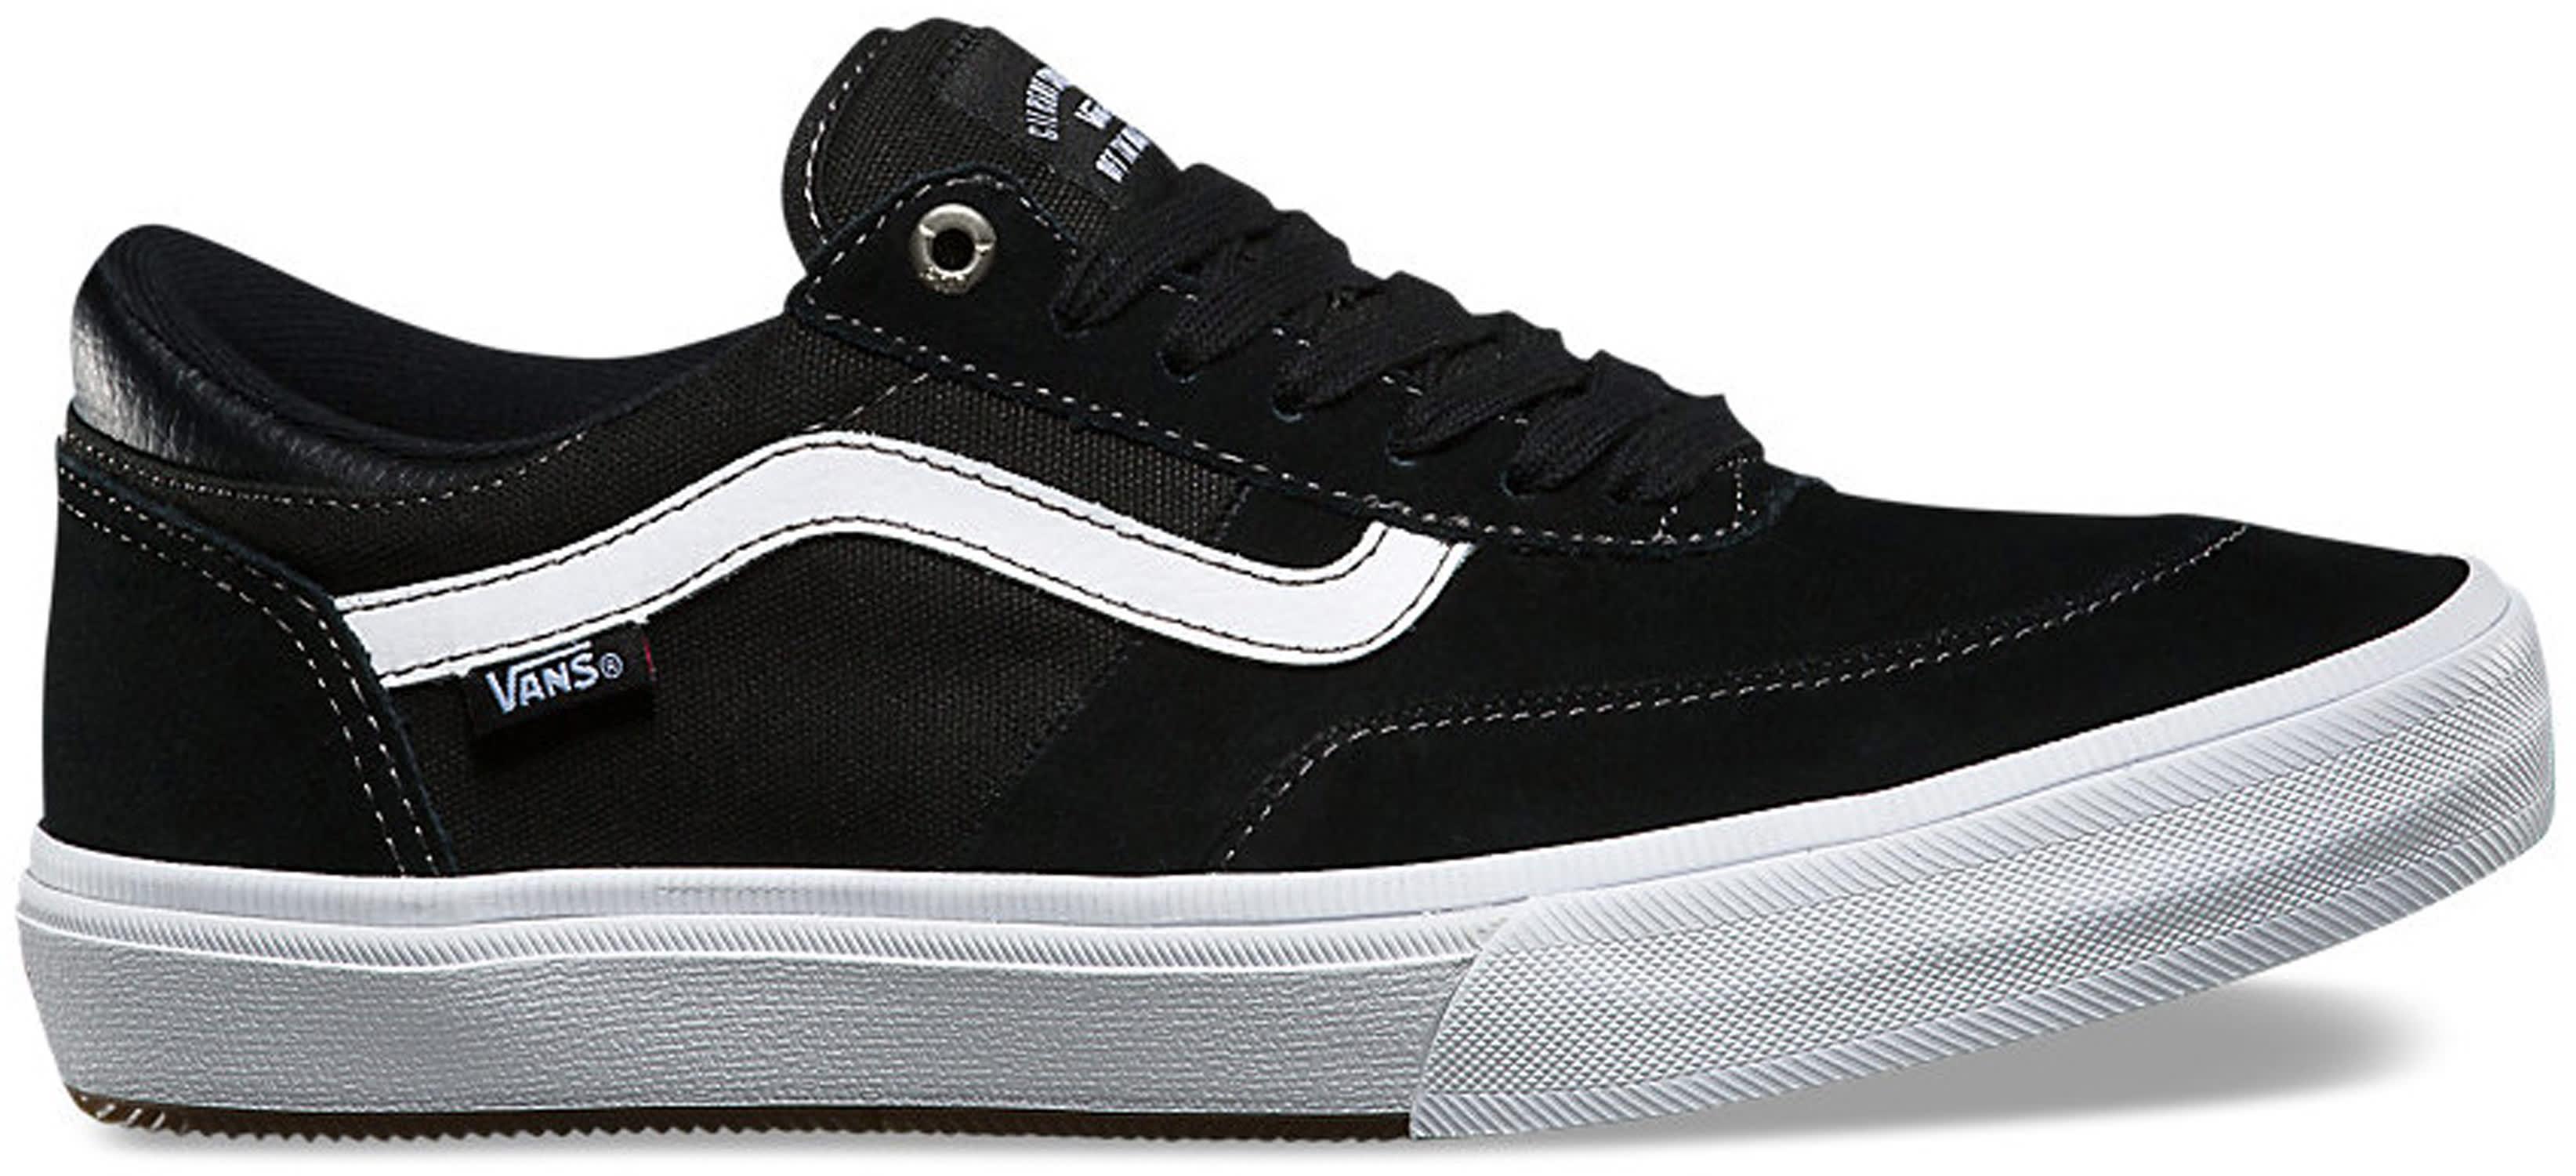 Vans Skate Shoes Black And White